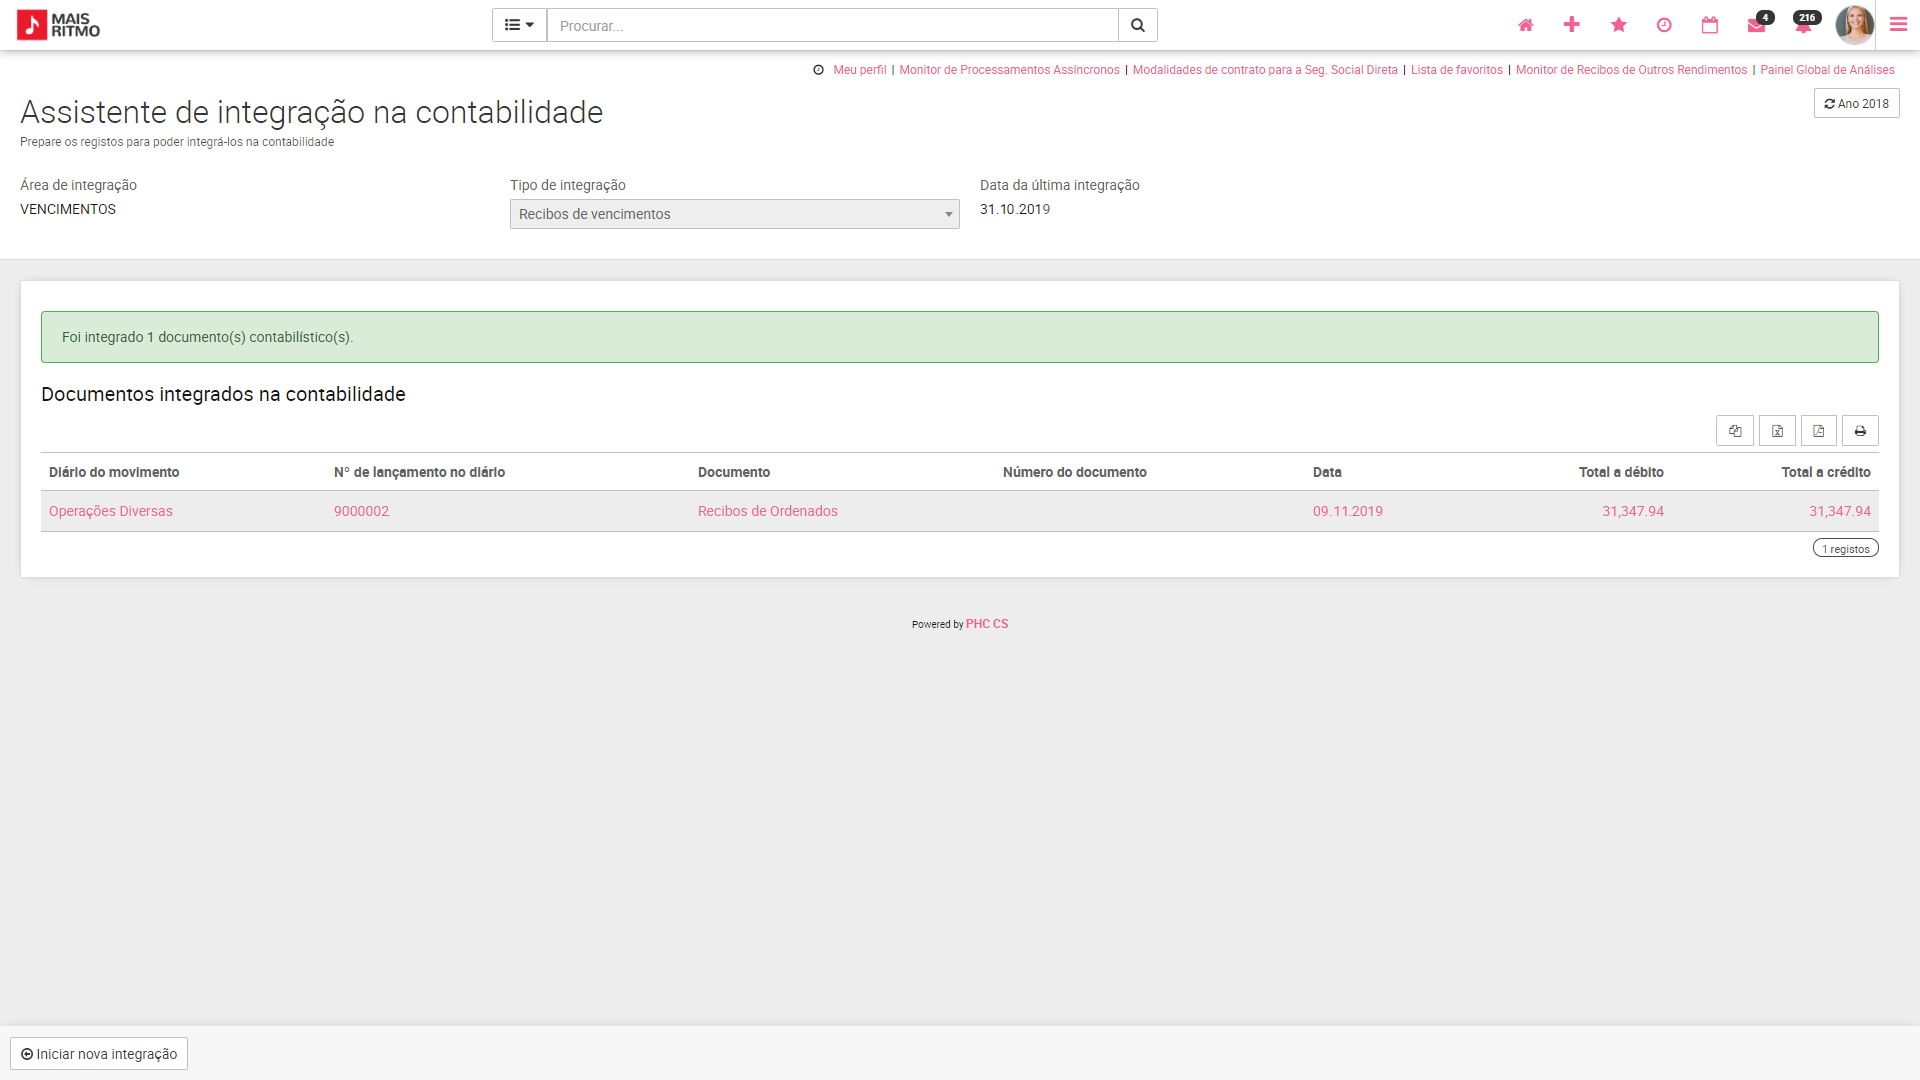 Monitor_Assistente_Integracoes_Contabilidade_vencimentos_web5